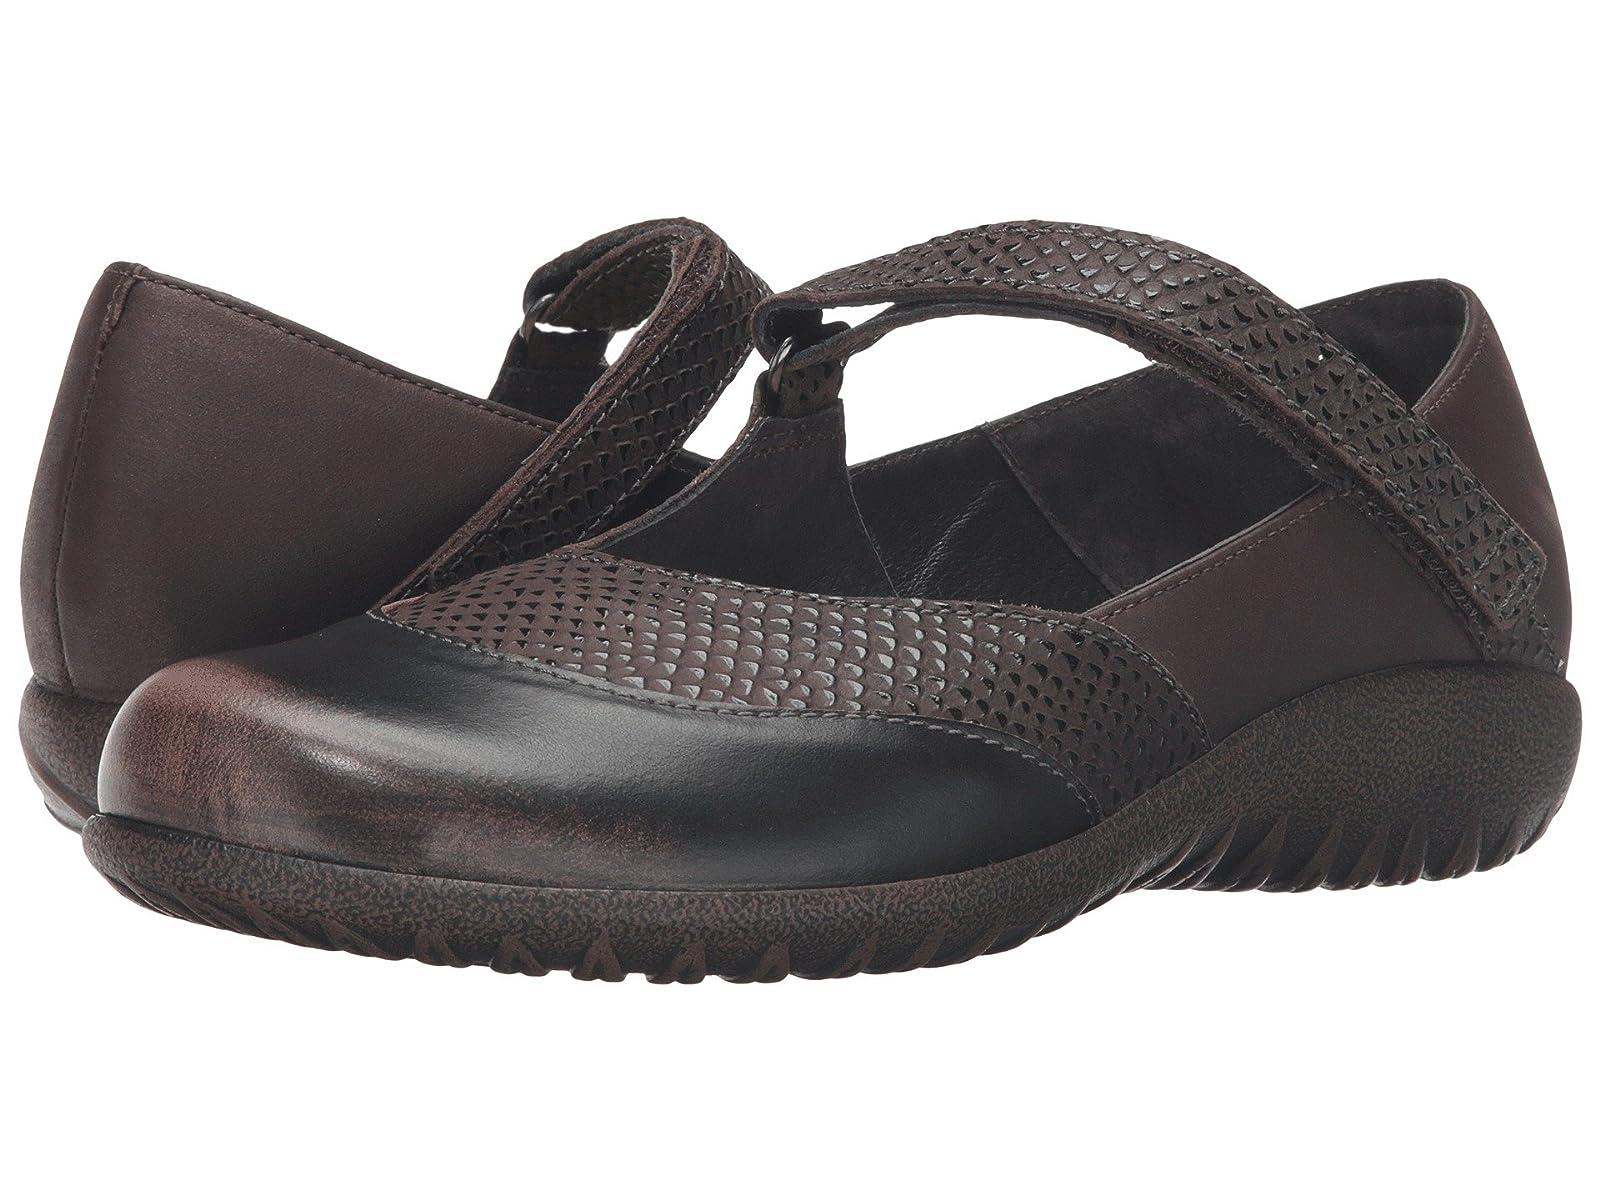 Naot LugaCheap and distinctive eye-catching shoes